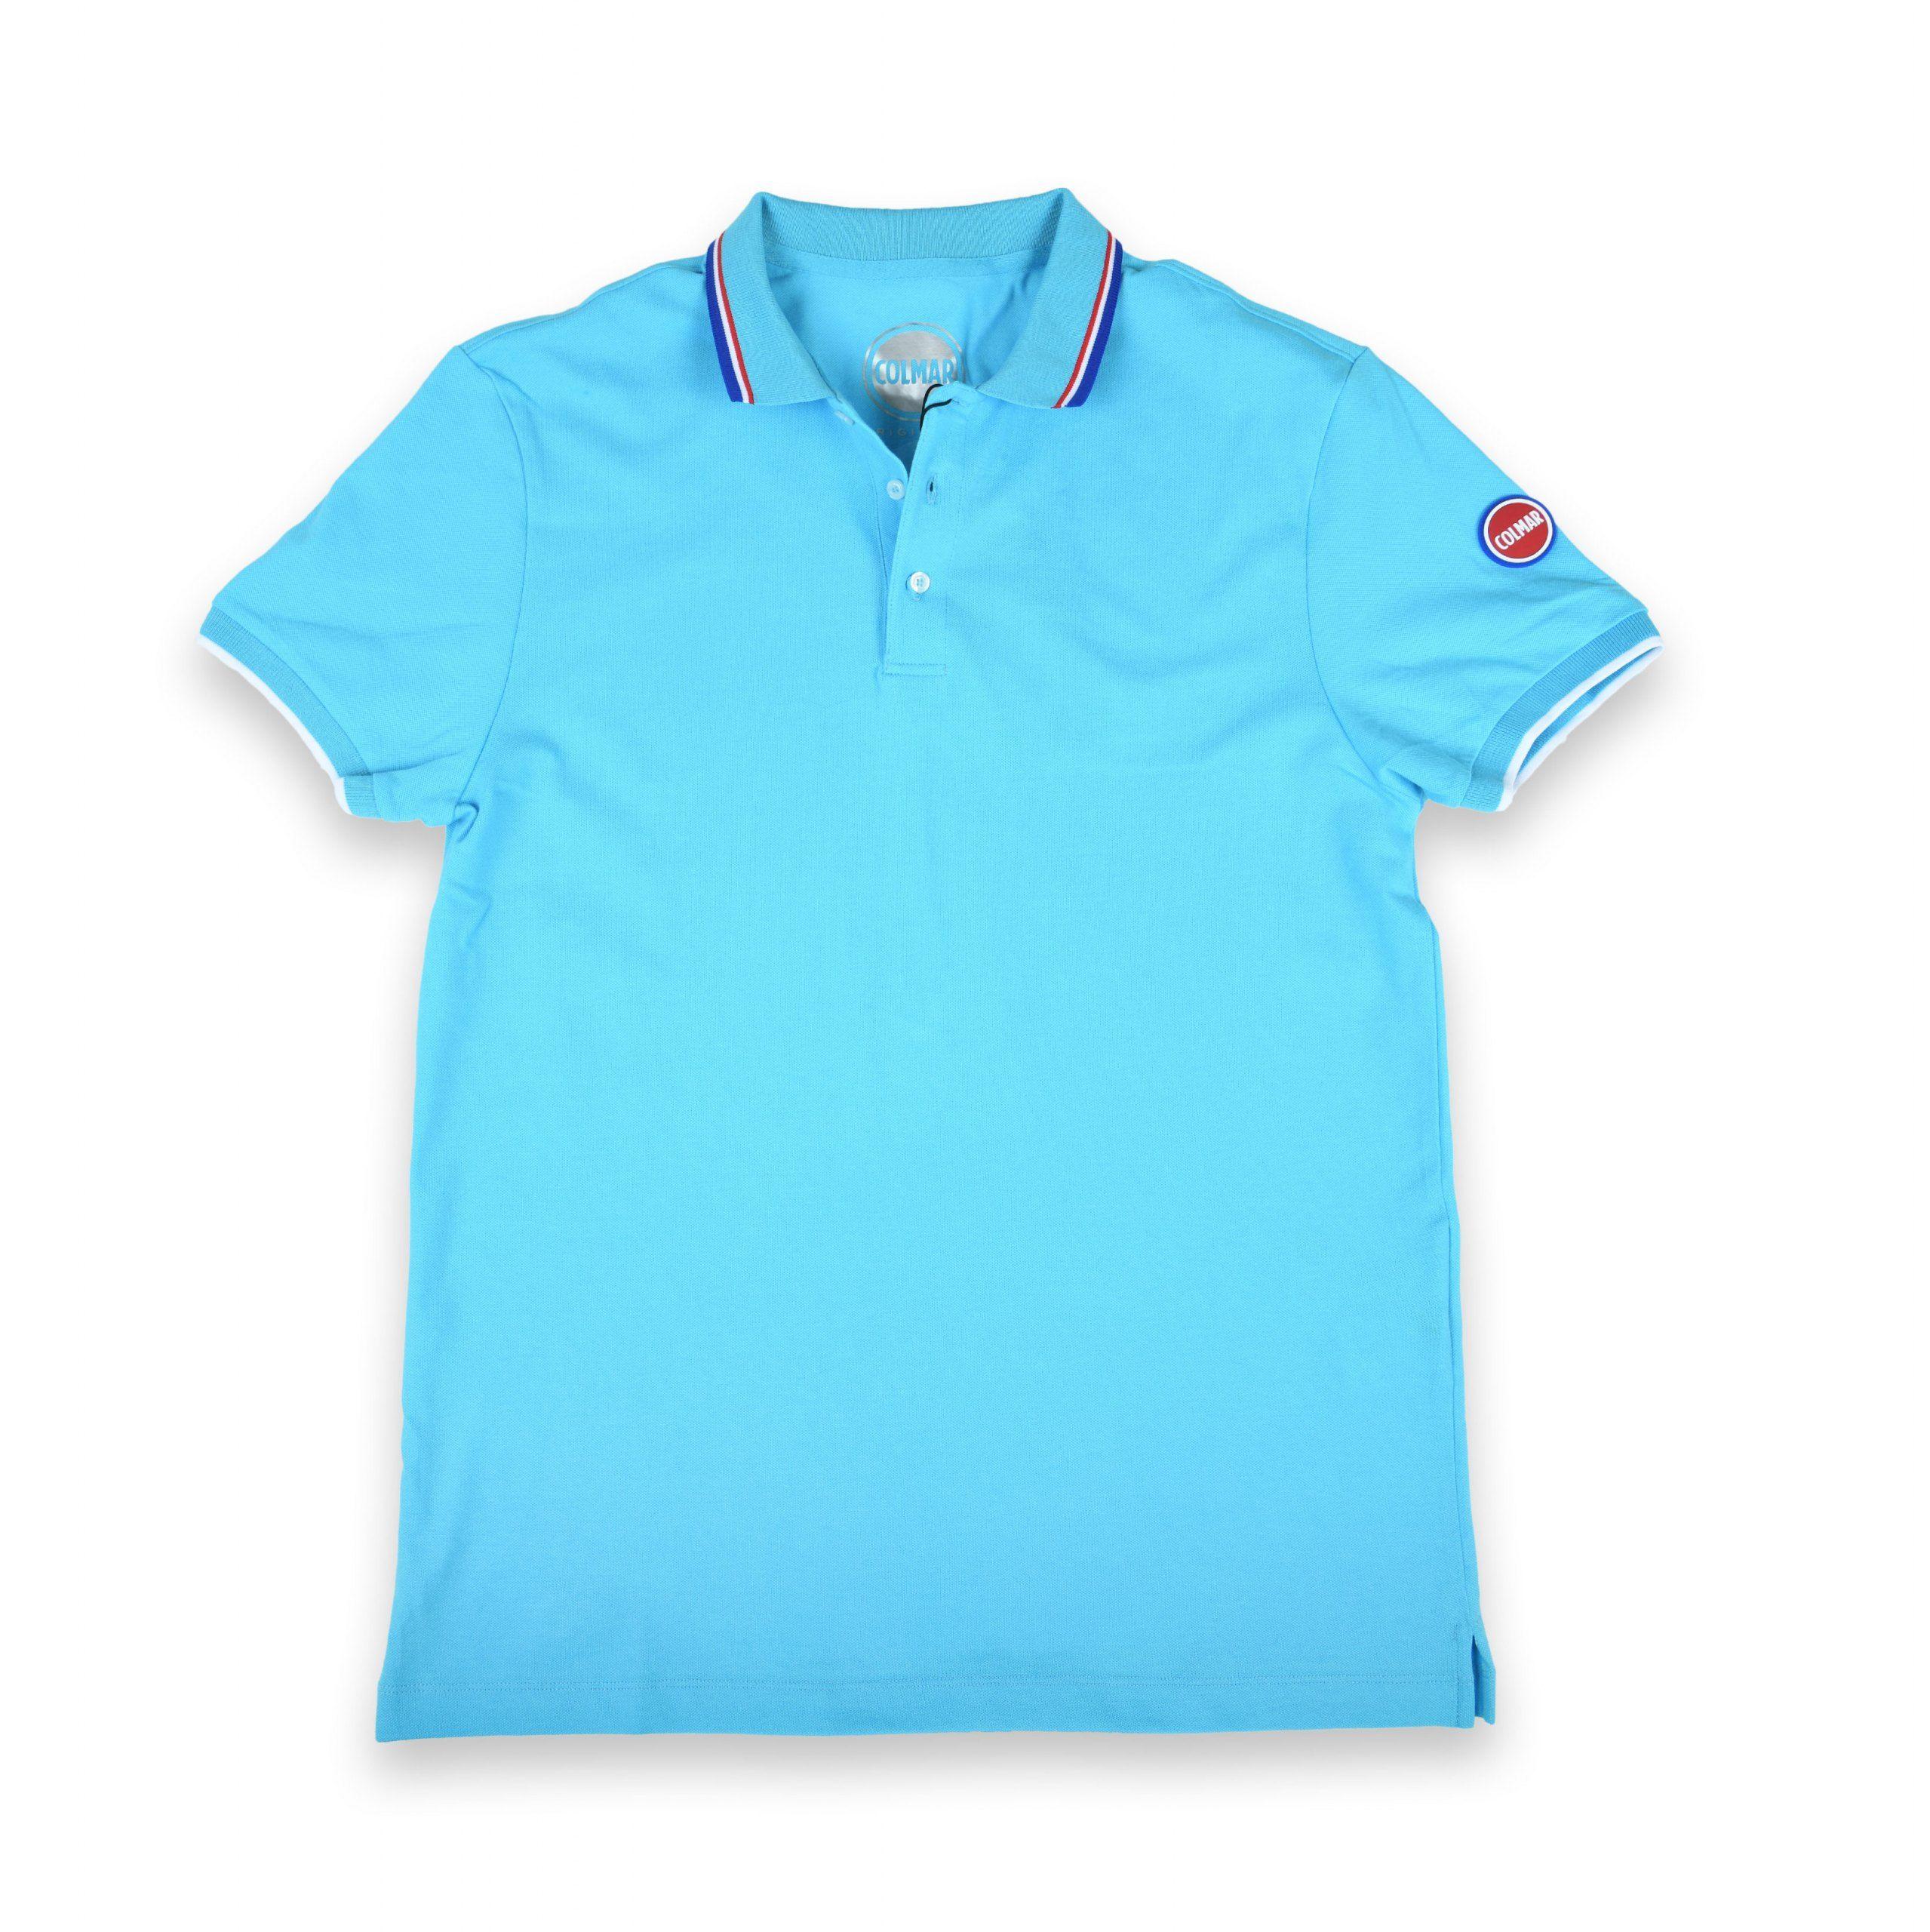 Poloshow Colmar Polo Blau 471 7659Z 4SH 1